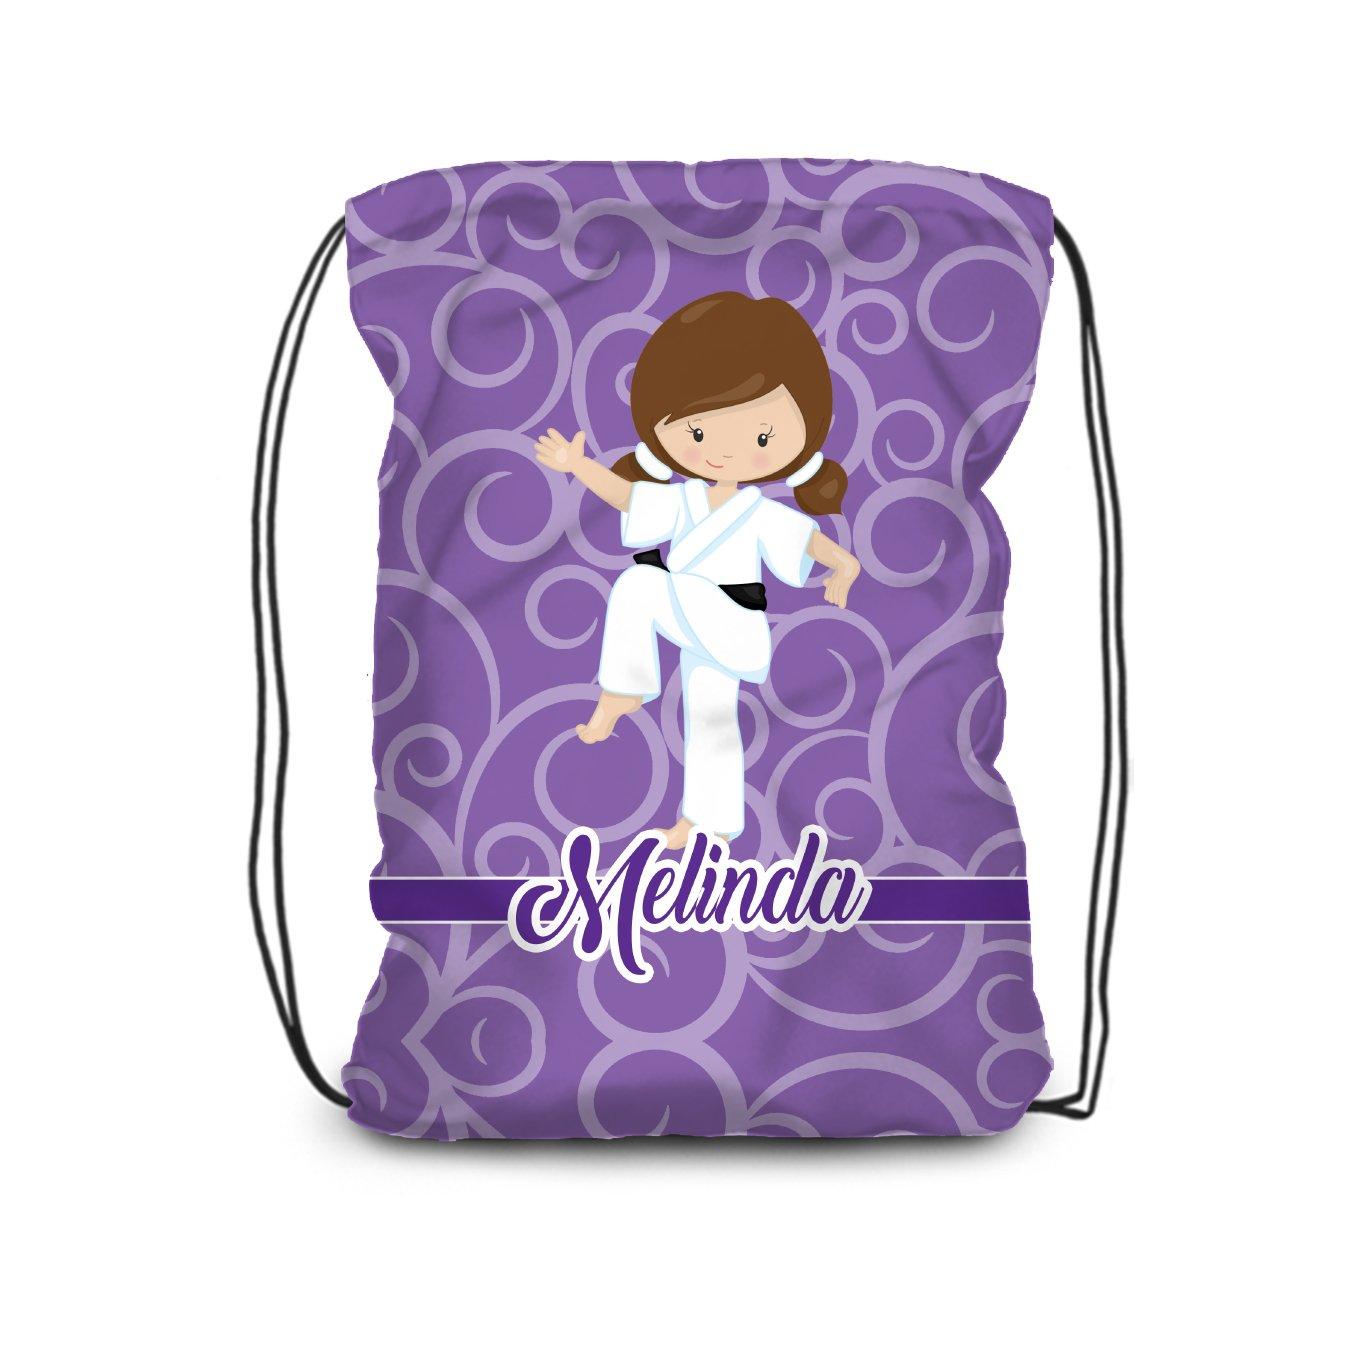 Karate Drawstring Backpack - Purple Karate Girl Personalized Name Bag